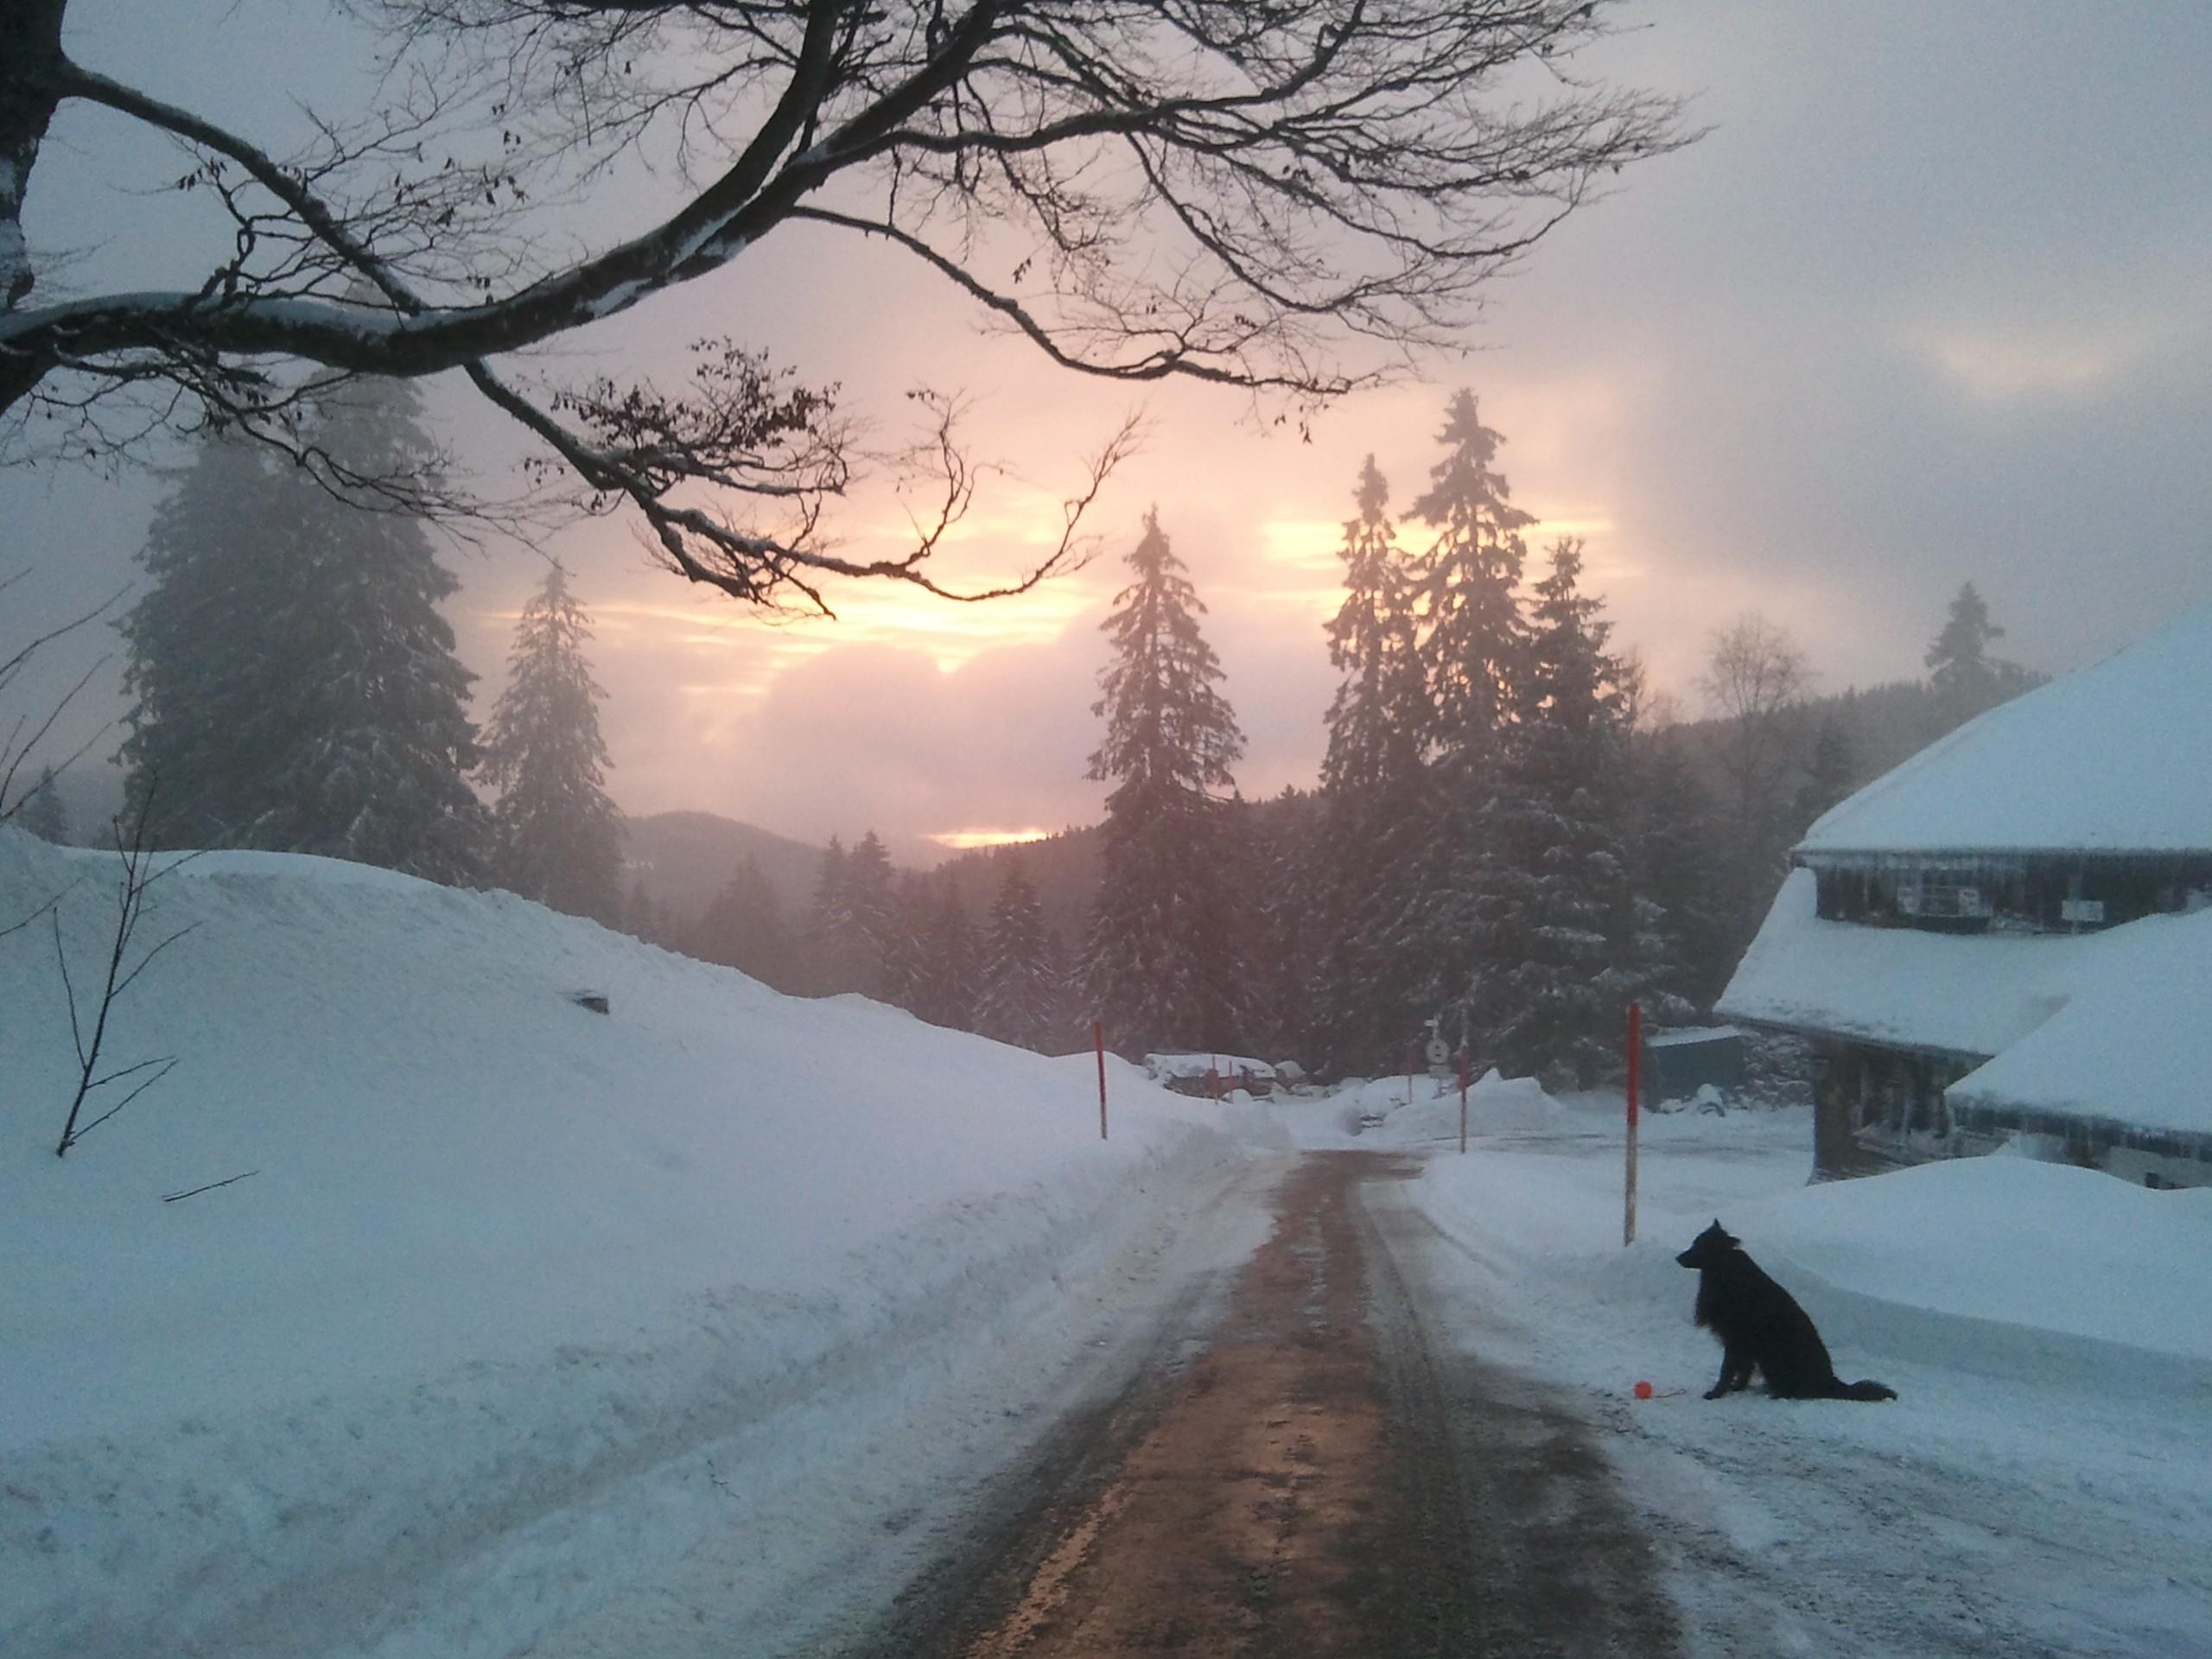 Sunrise at Feldberg